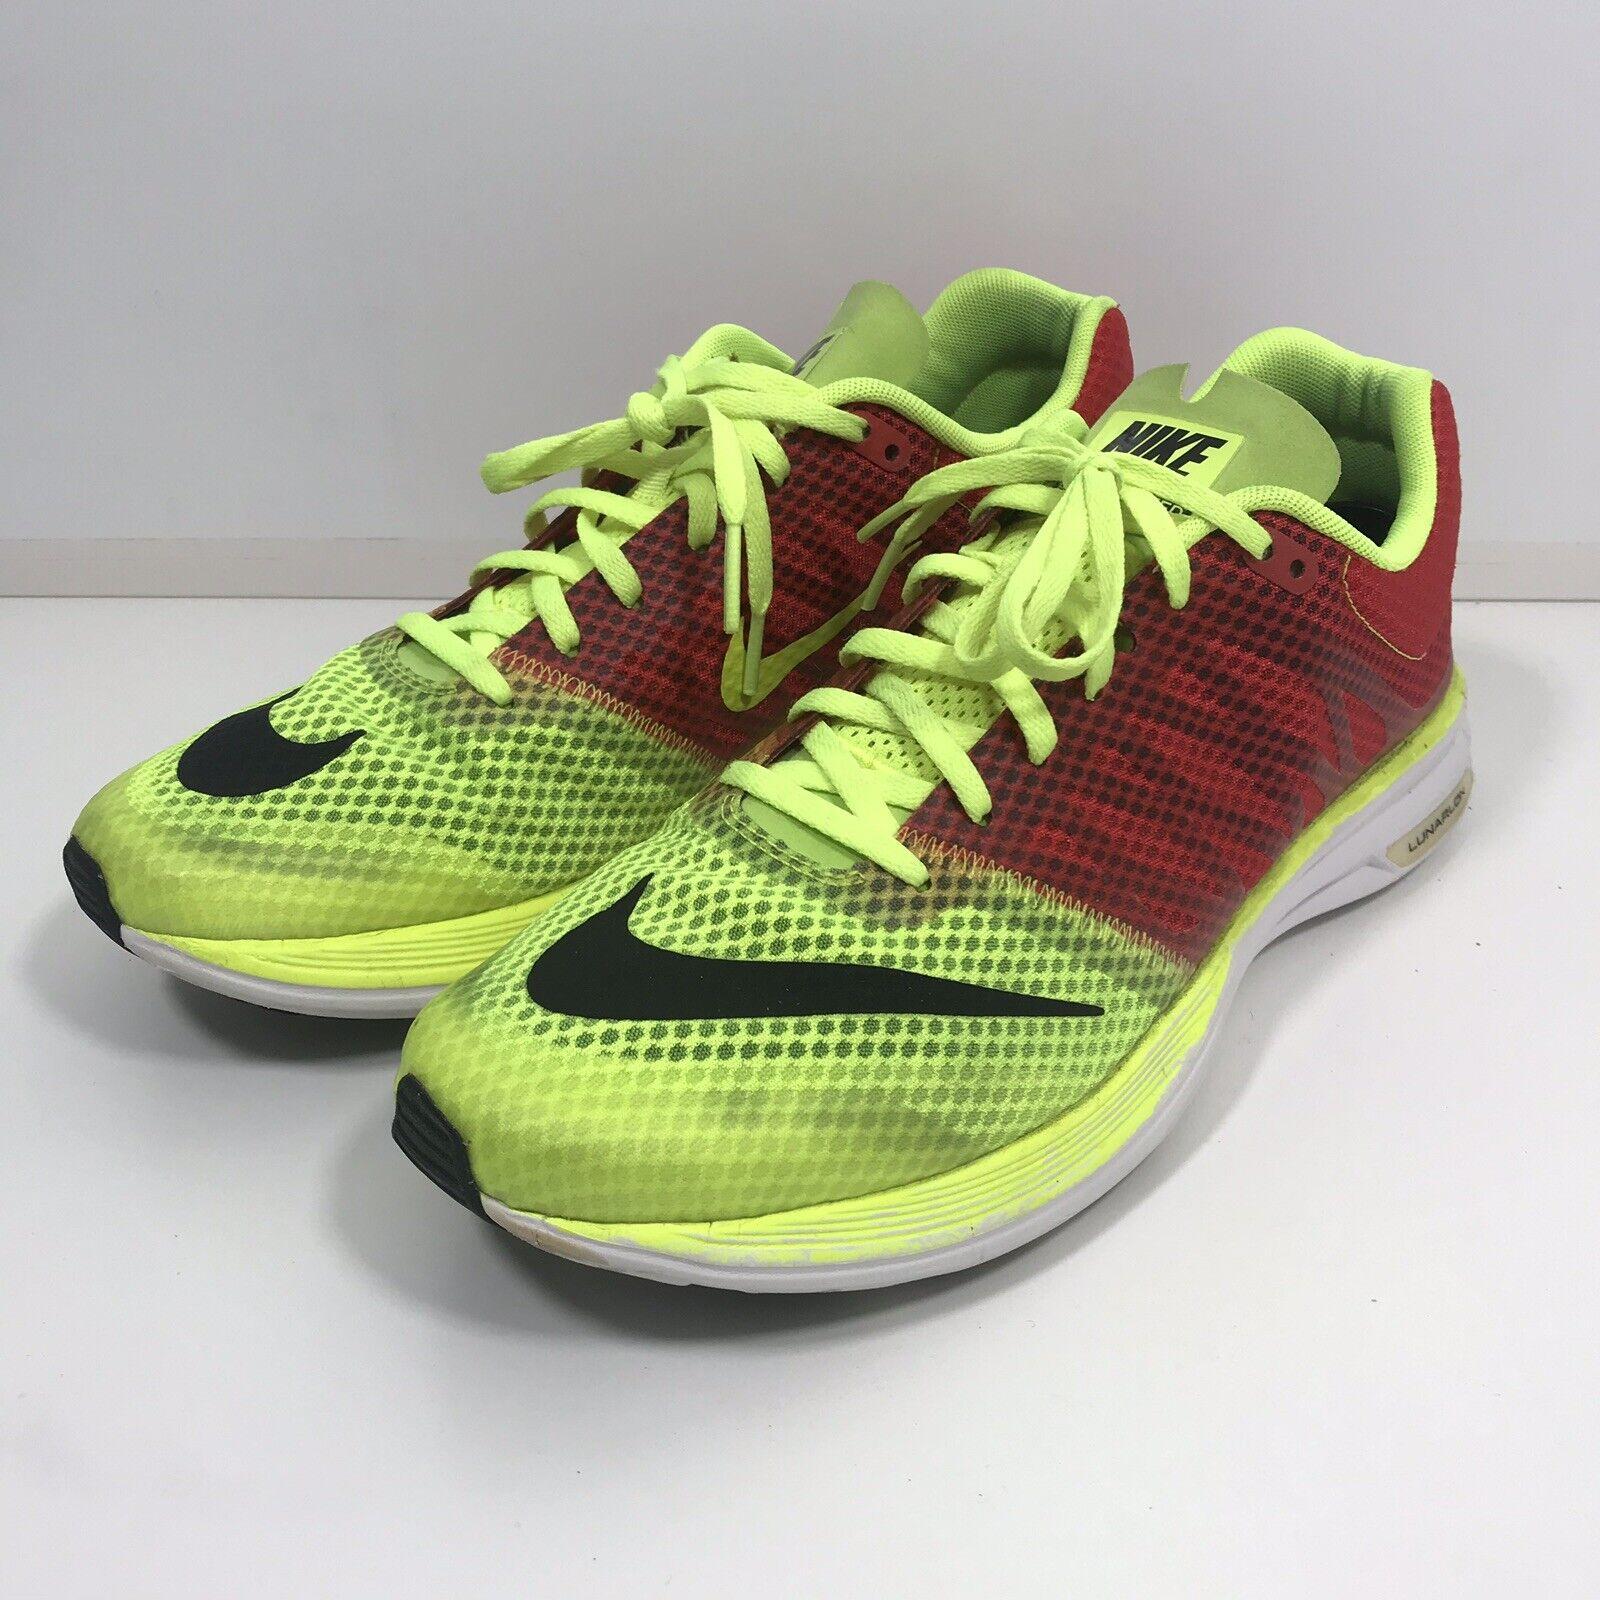 Nike Lunarspeed Lunarlon Baskets Homme Taille 11 Chaussure De Course Volt rouge 554682-706